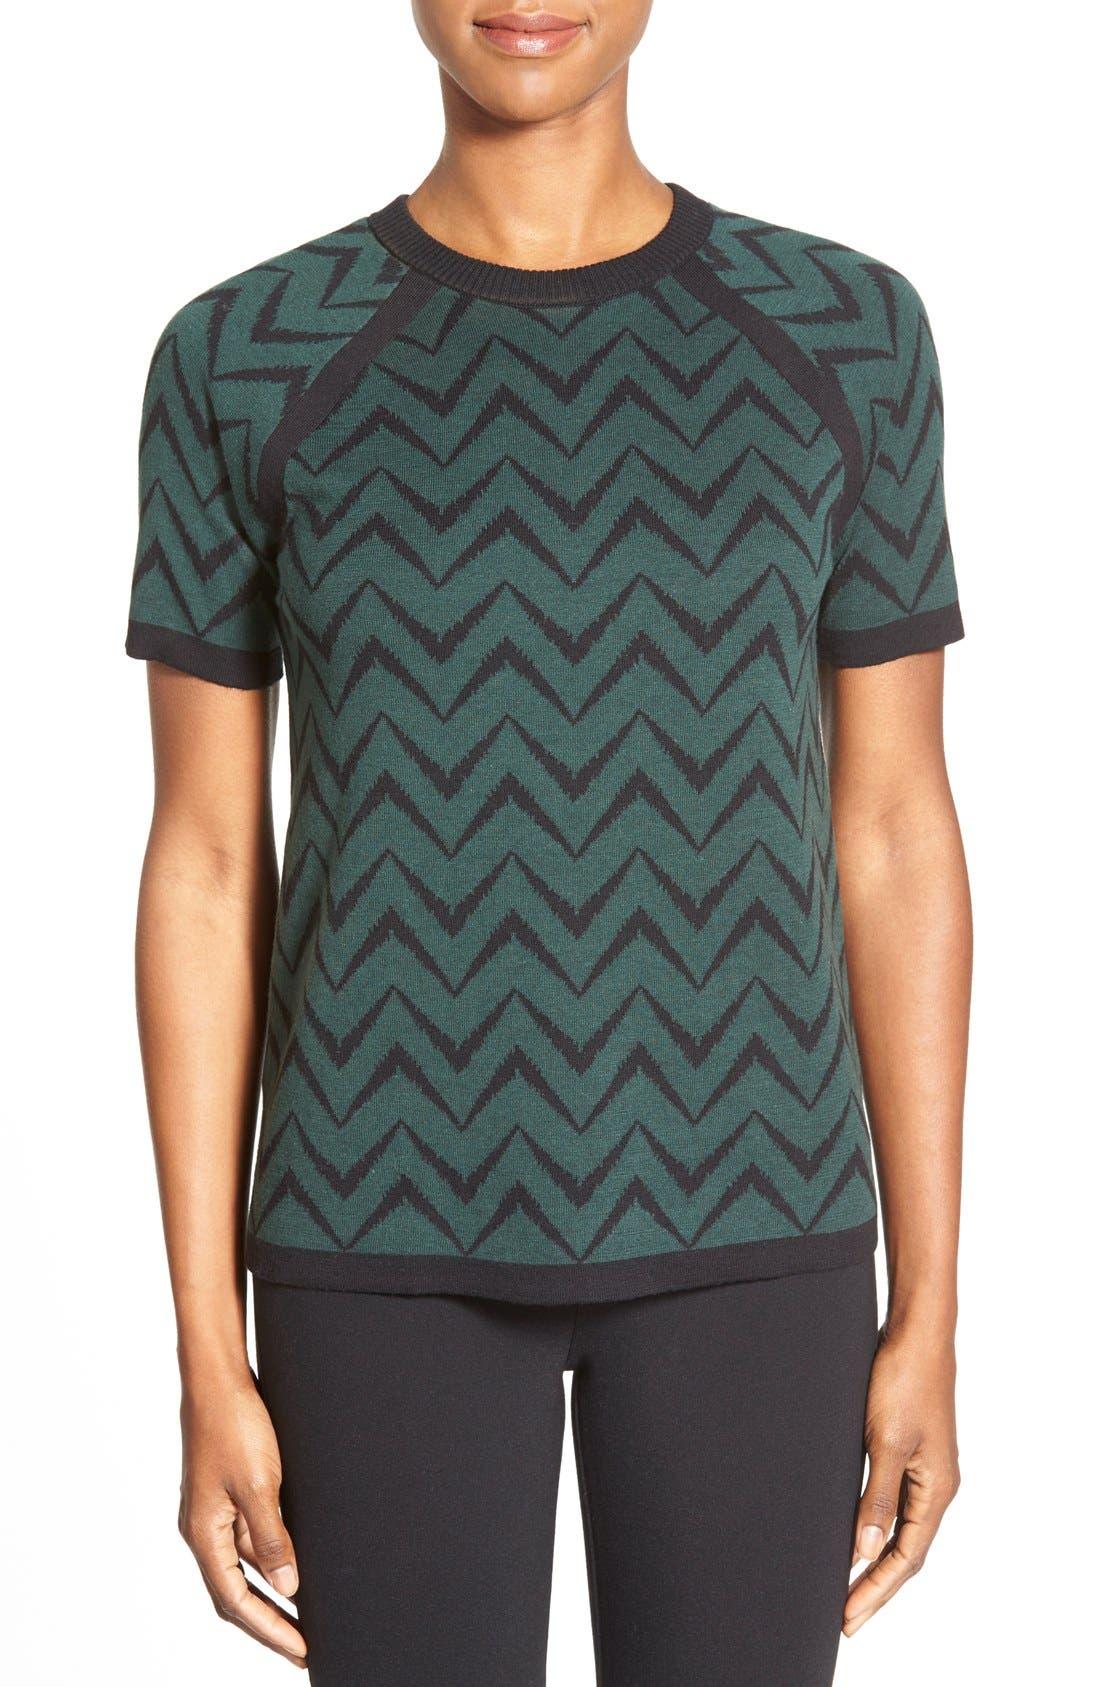 Alternate Image 1 Selected - Anne Klein Chevron Stripe Crewneck Sweater